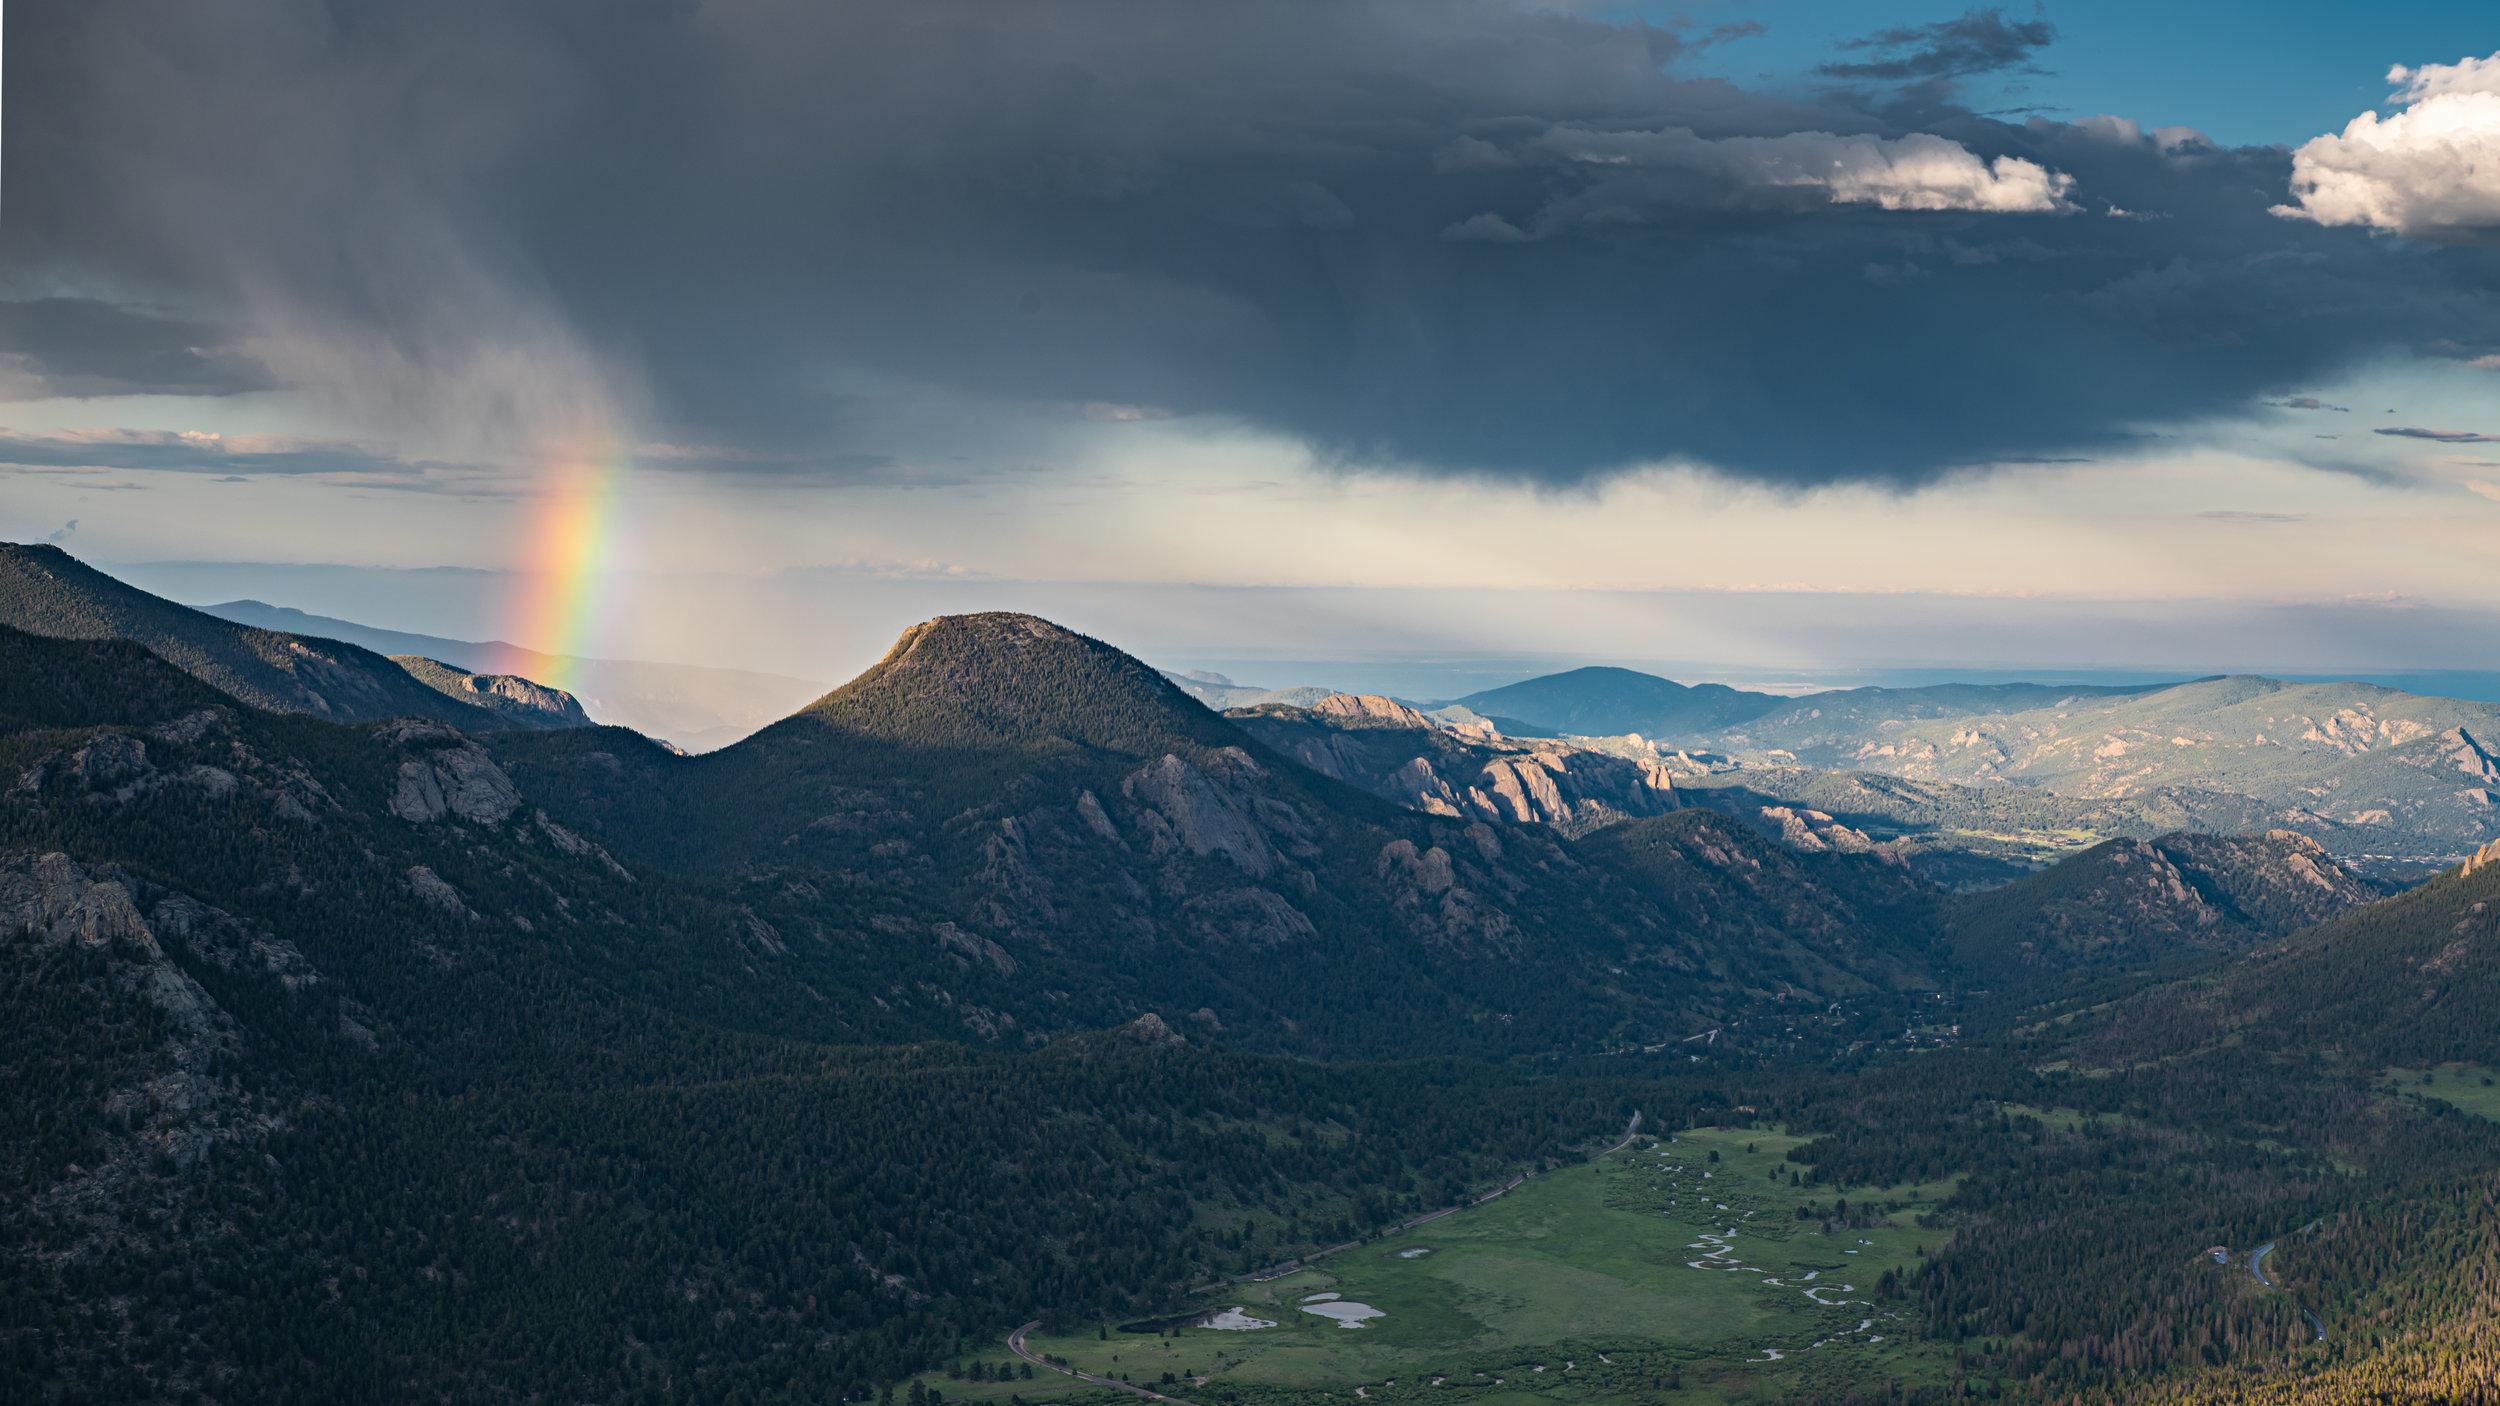 Rainbow Curve. Rocky Mountain National Park July 2019